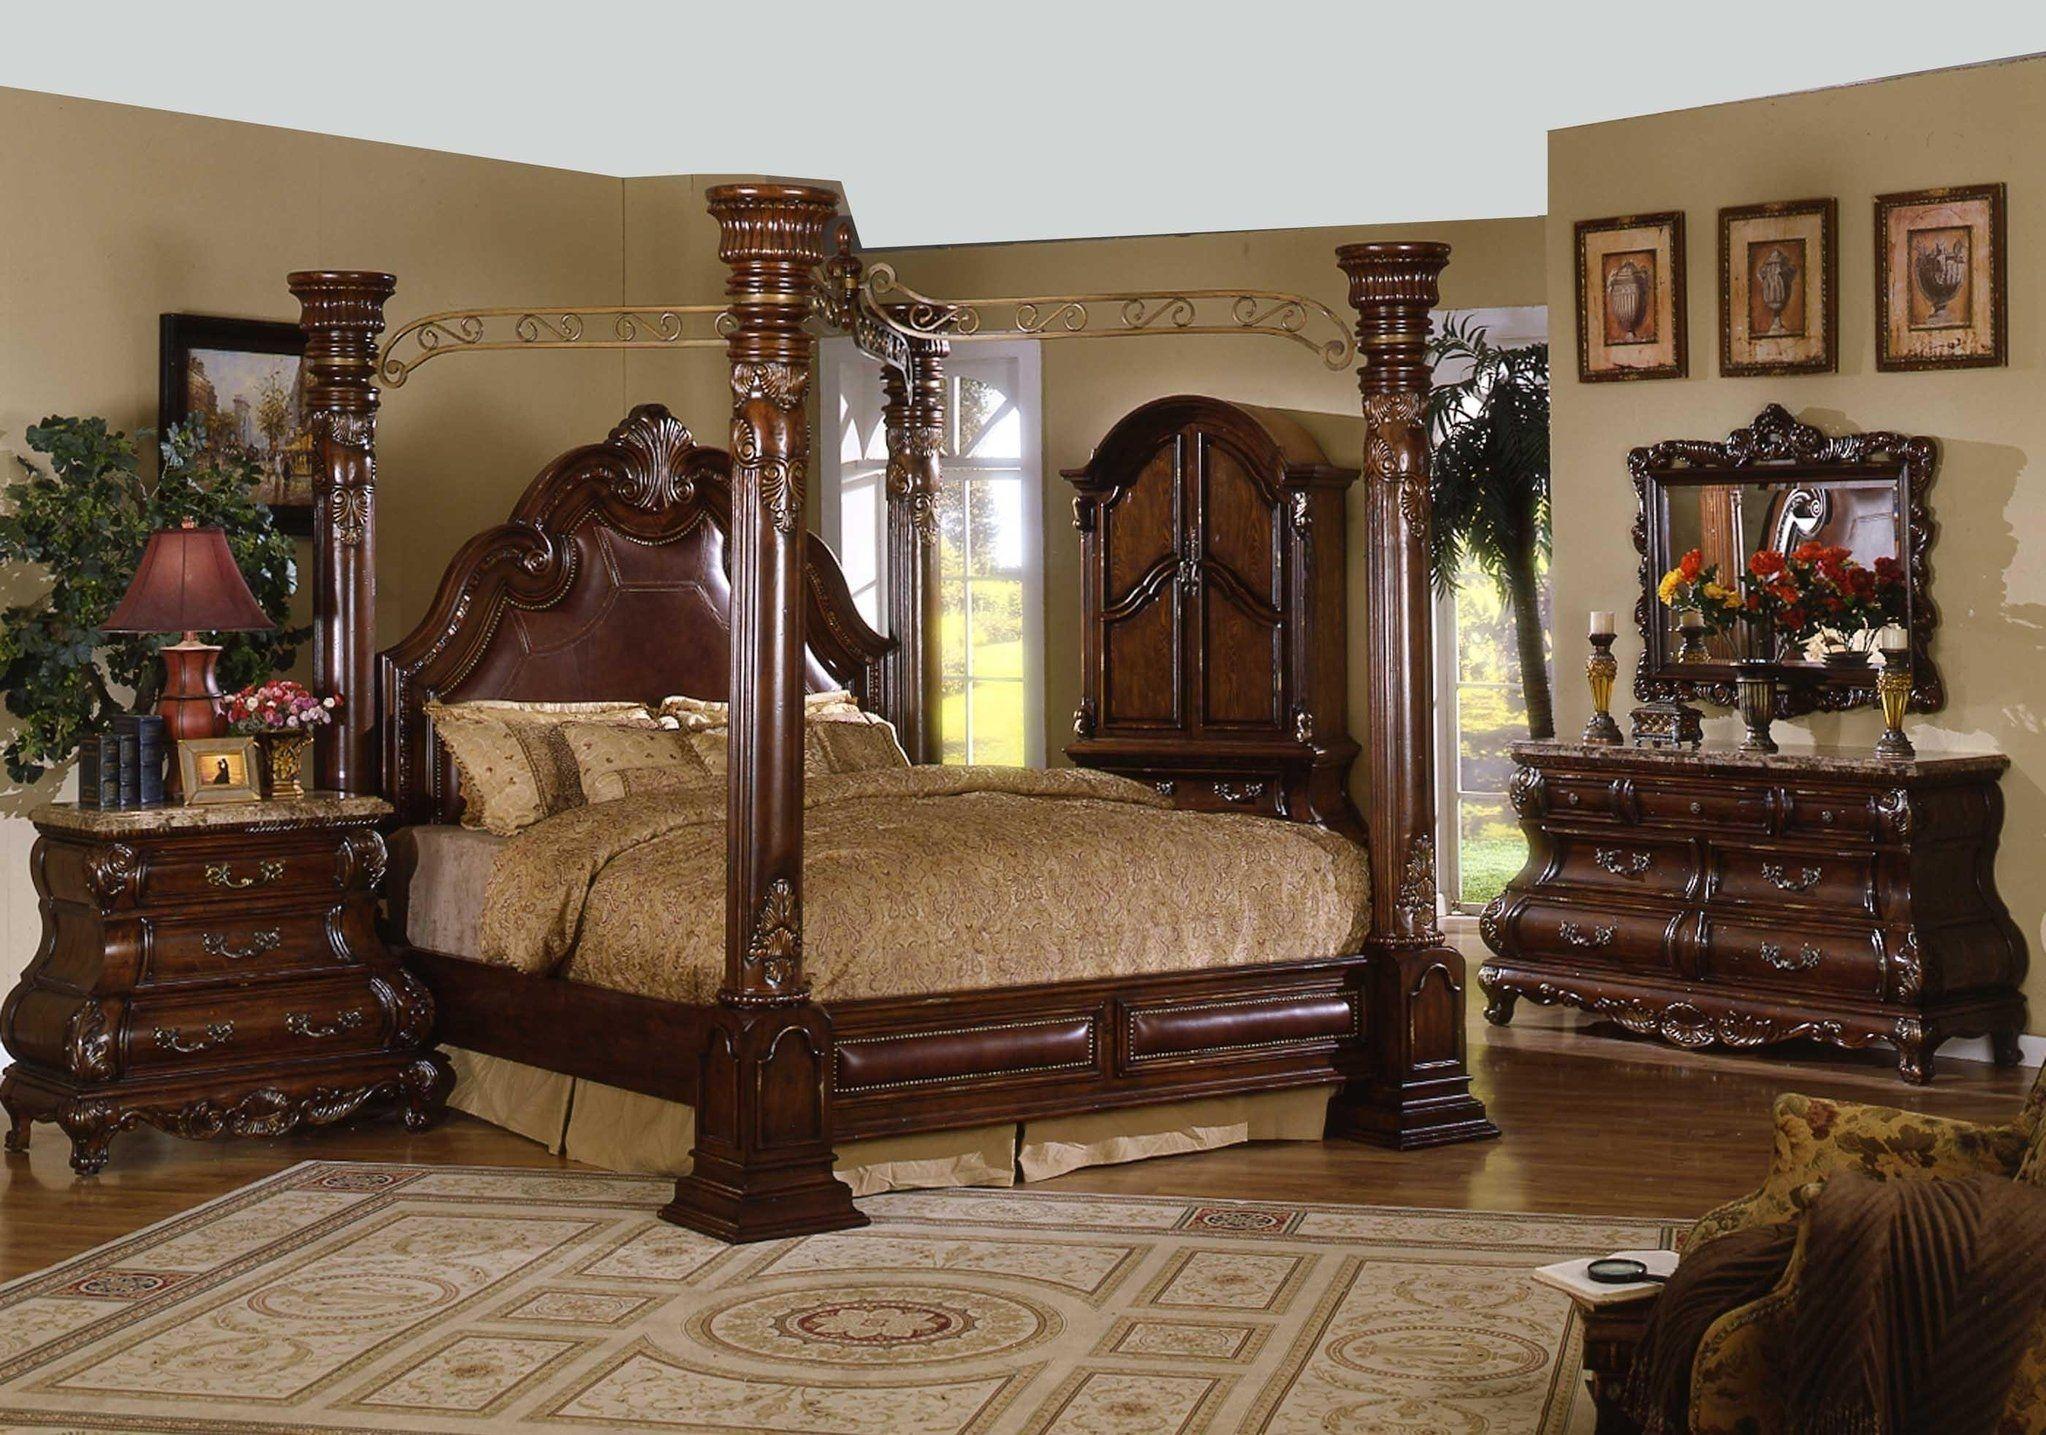 Four Post King Size Bedroom Sets Canopy bedroom sets